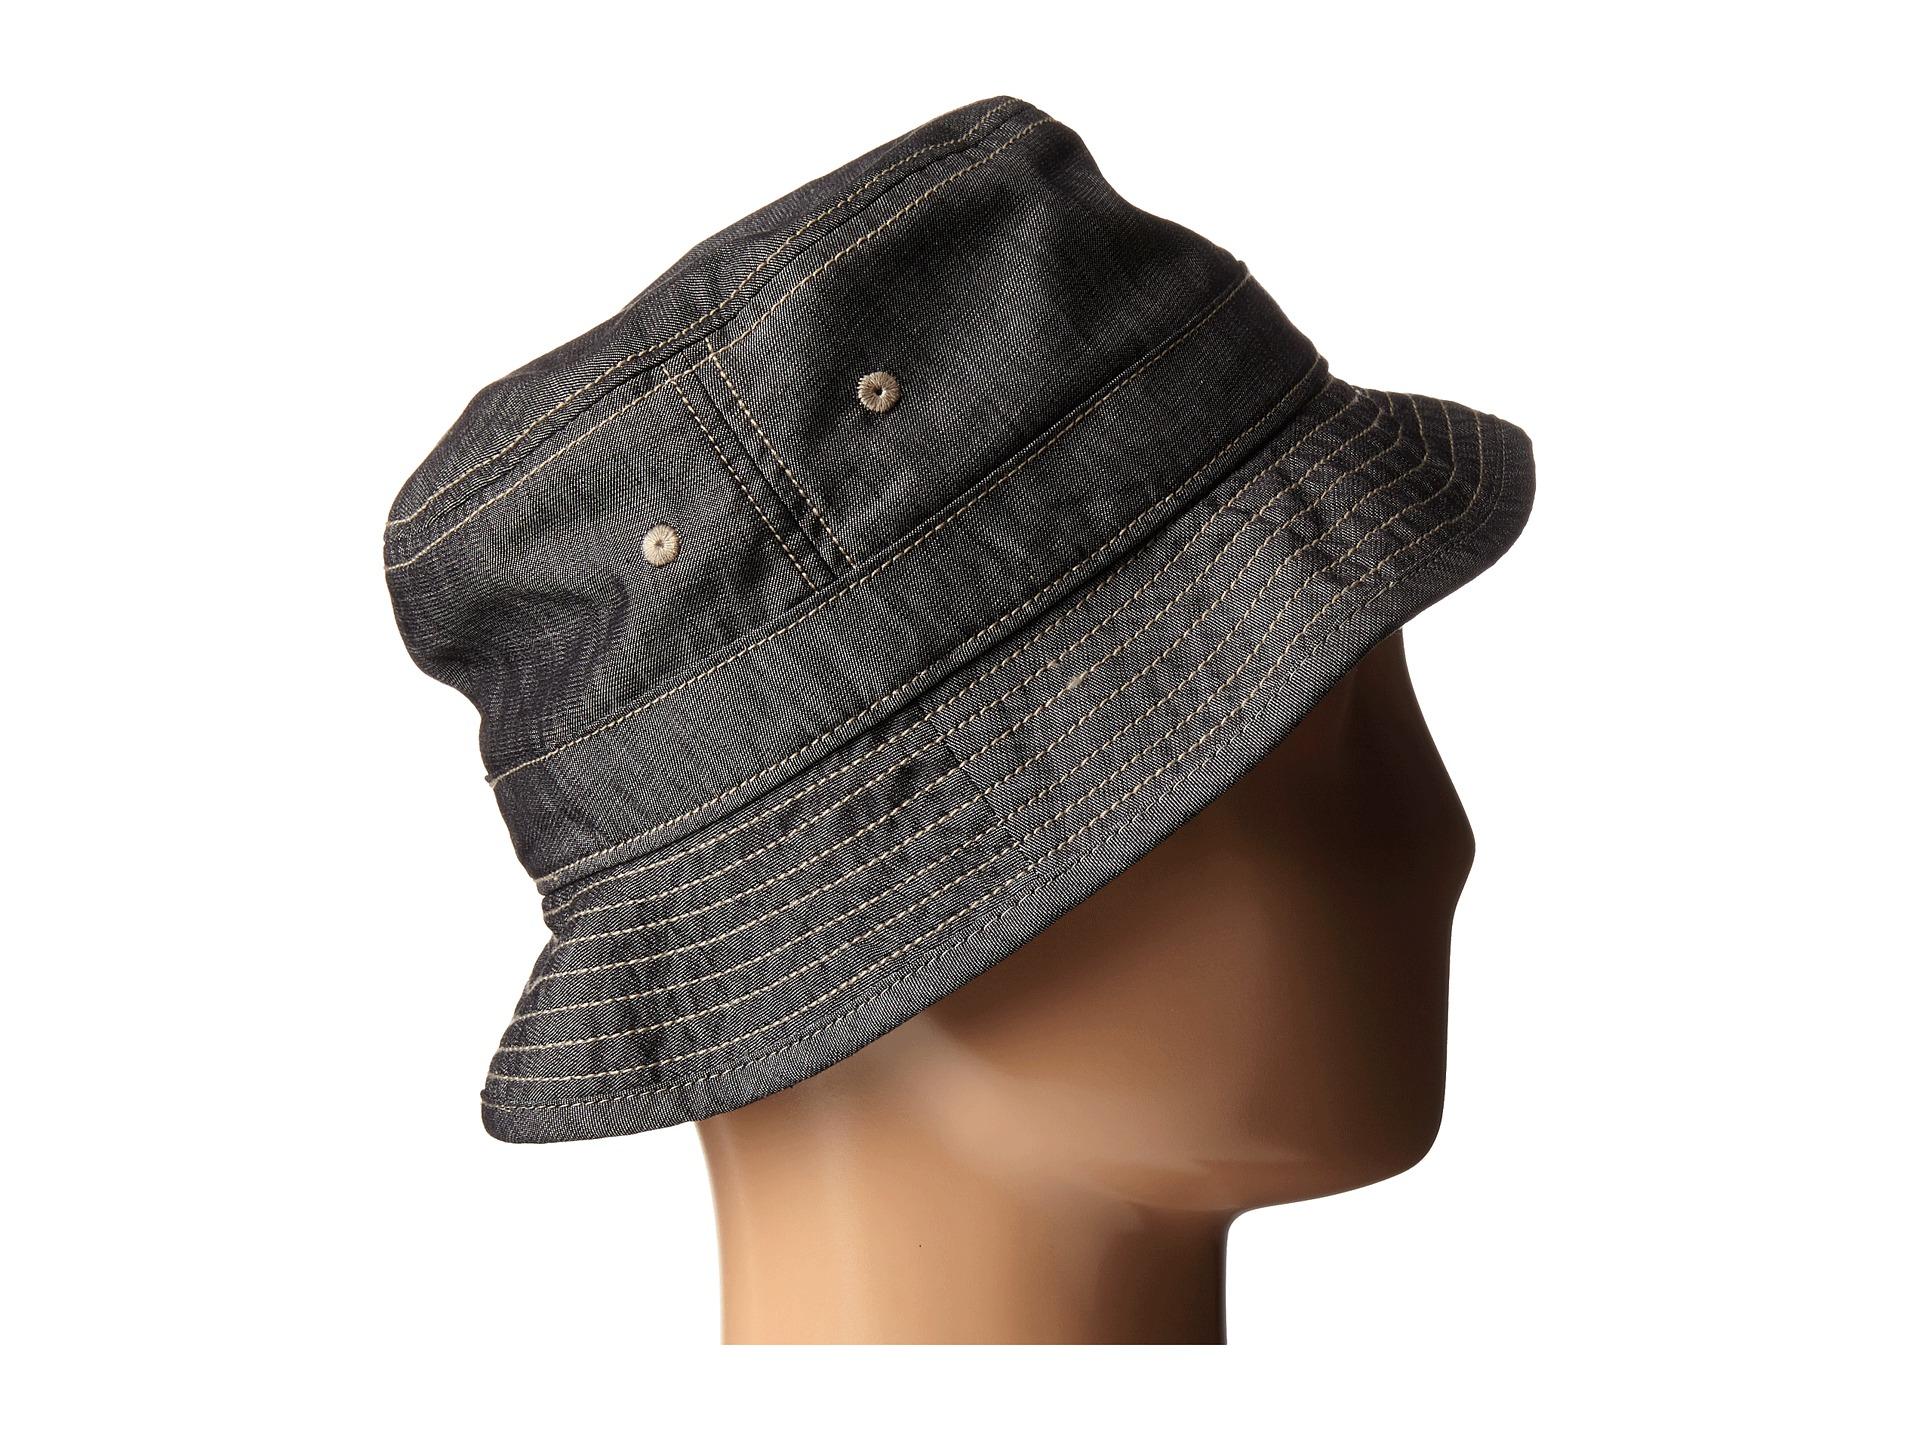 d6f1770173a Lyst - Original Penguin Chambray Bucket Hat in Black for Men